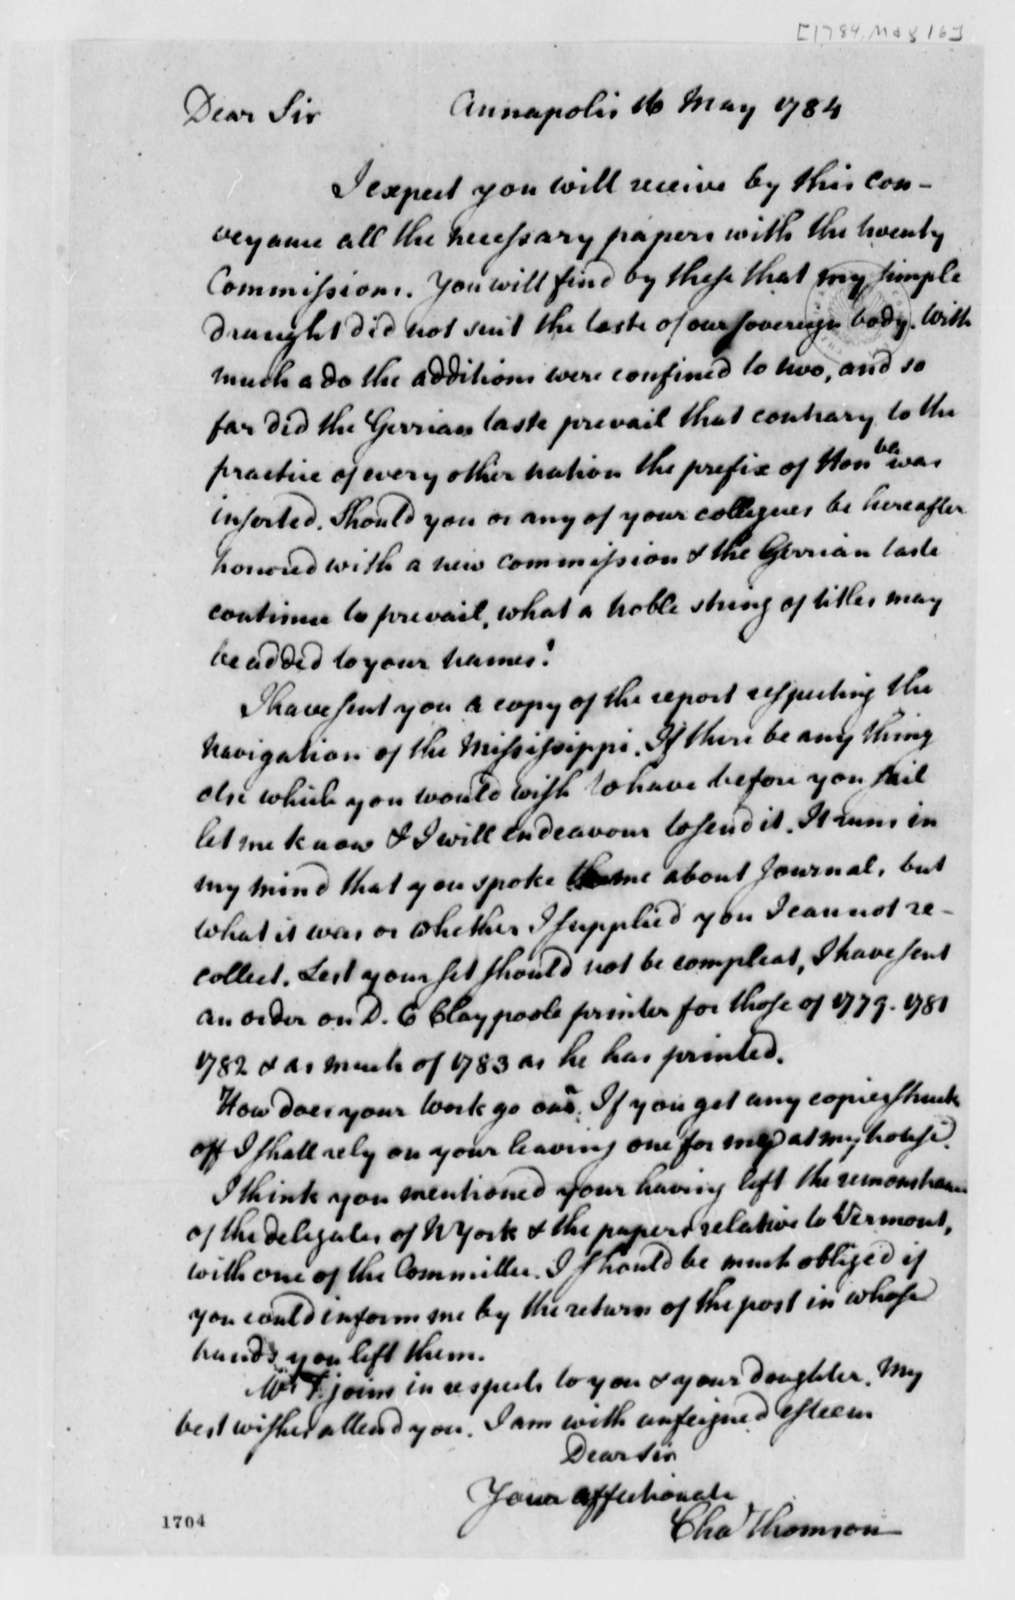 Charles Thomson to Thomas Jefferson, May 16, 1784